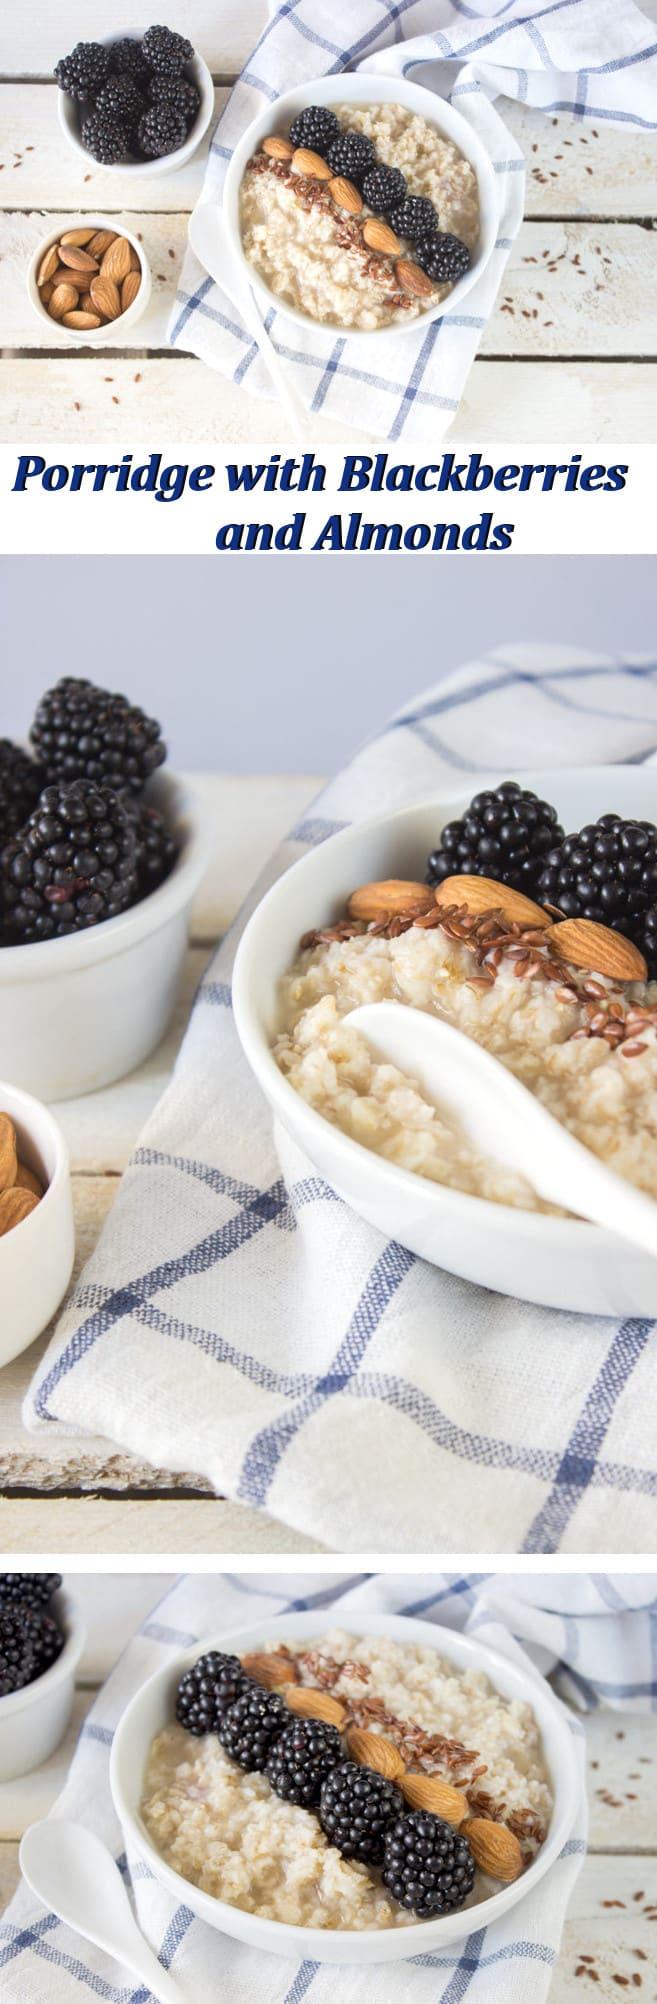 Porridge with Blackberries